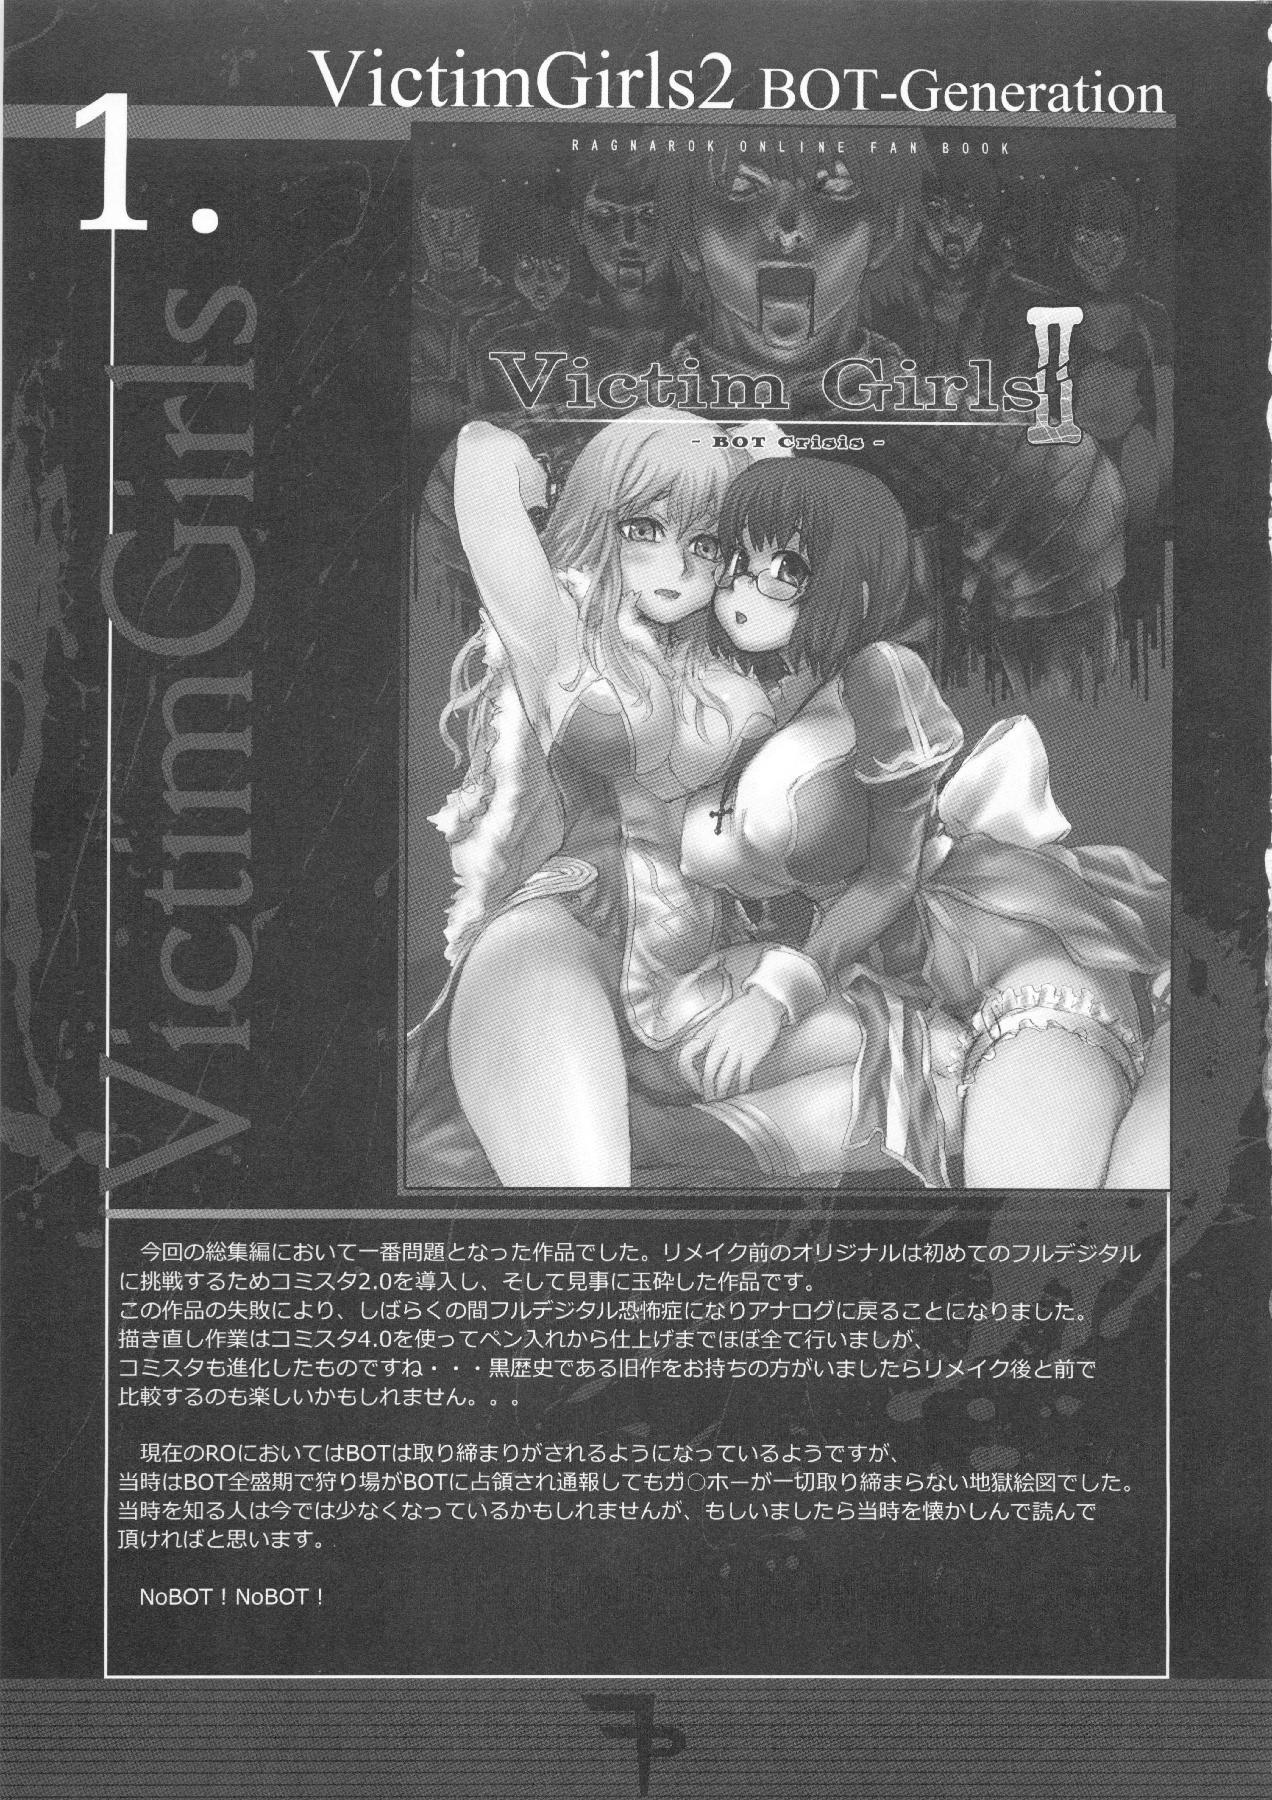 (C83) [Fatalpulse (Asanagi)] VictimGirls Compiled Vol.1 -Victimgirls Soushuuhen 1- MMO Game Selection (Various) 7